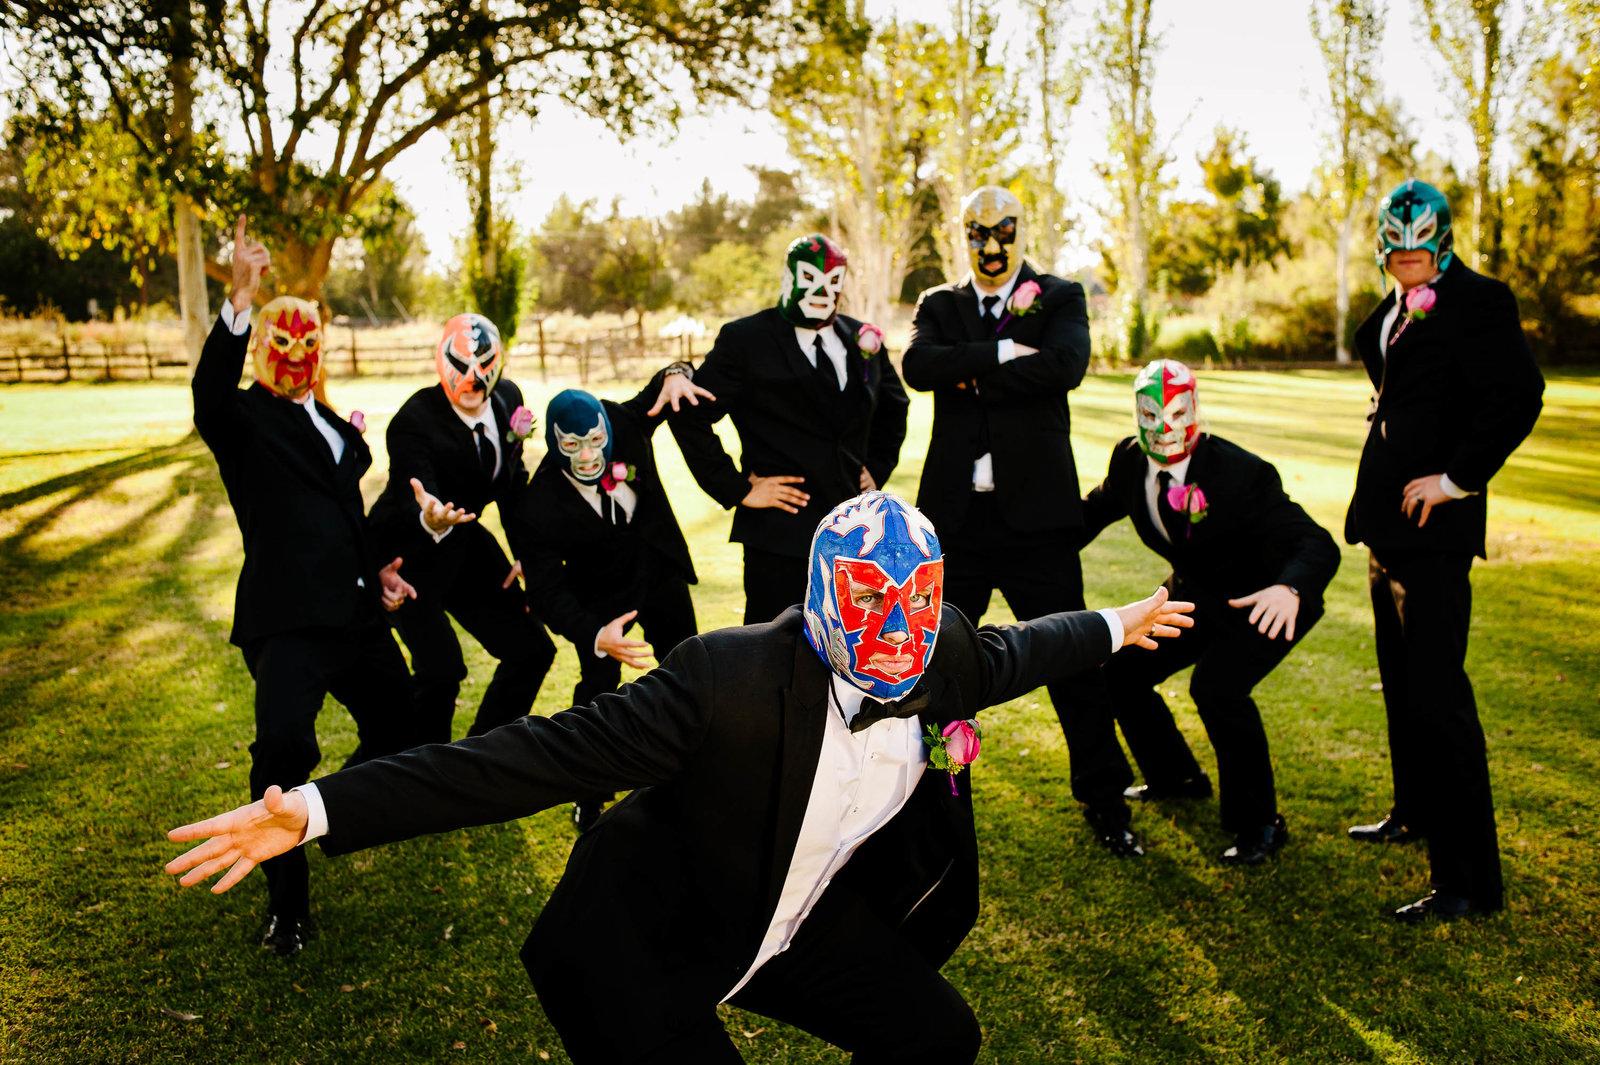 192-El-paso-wedding-photographer-El Paso Wedding Photographer_M16